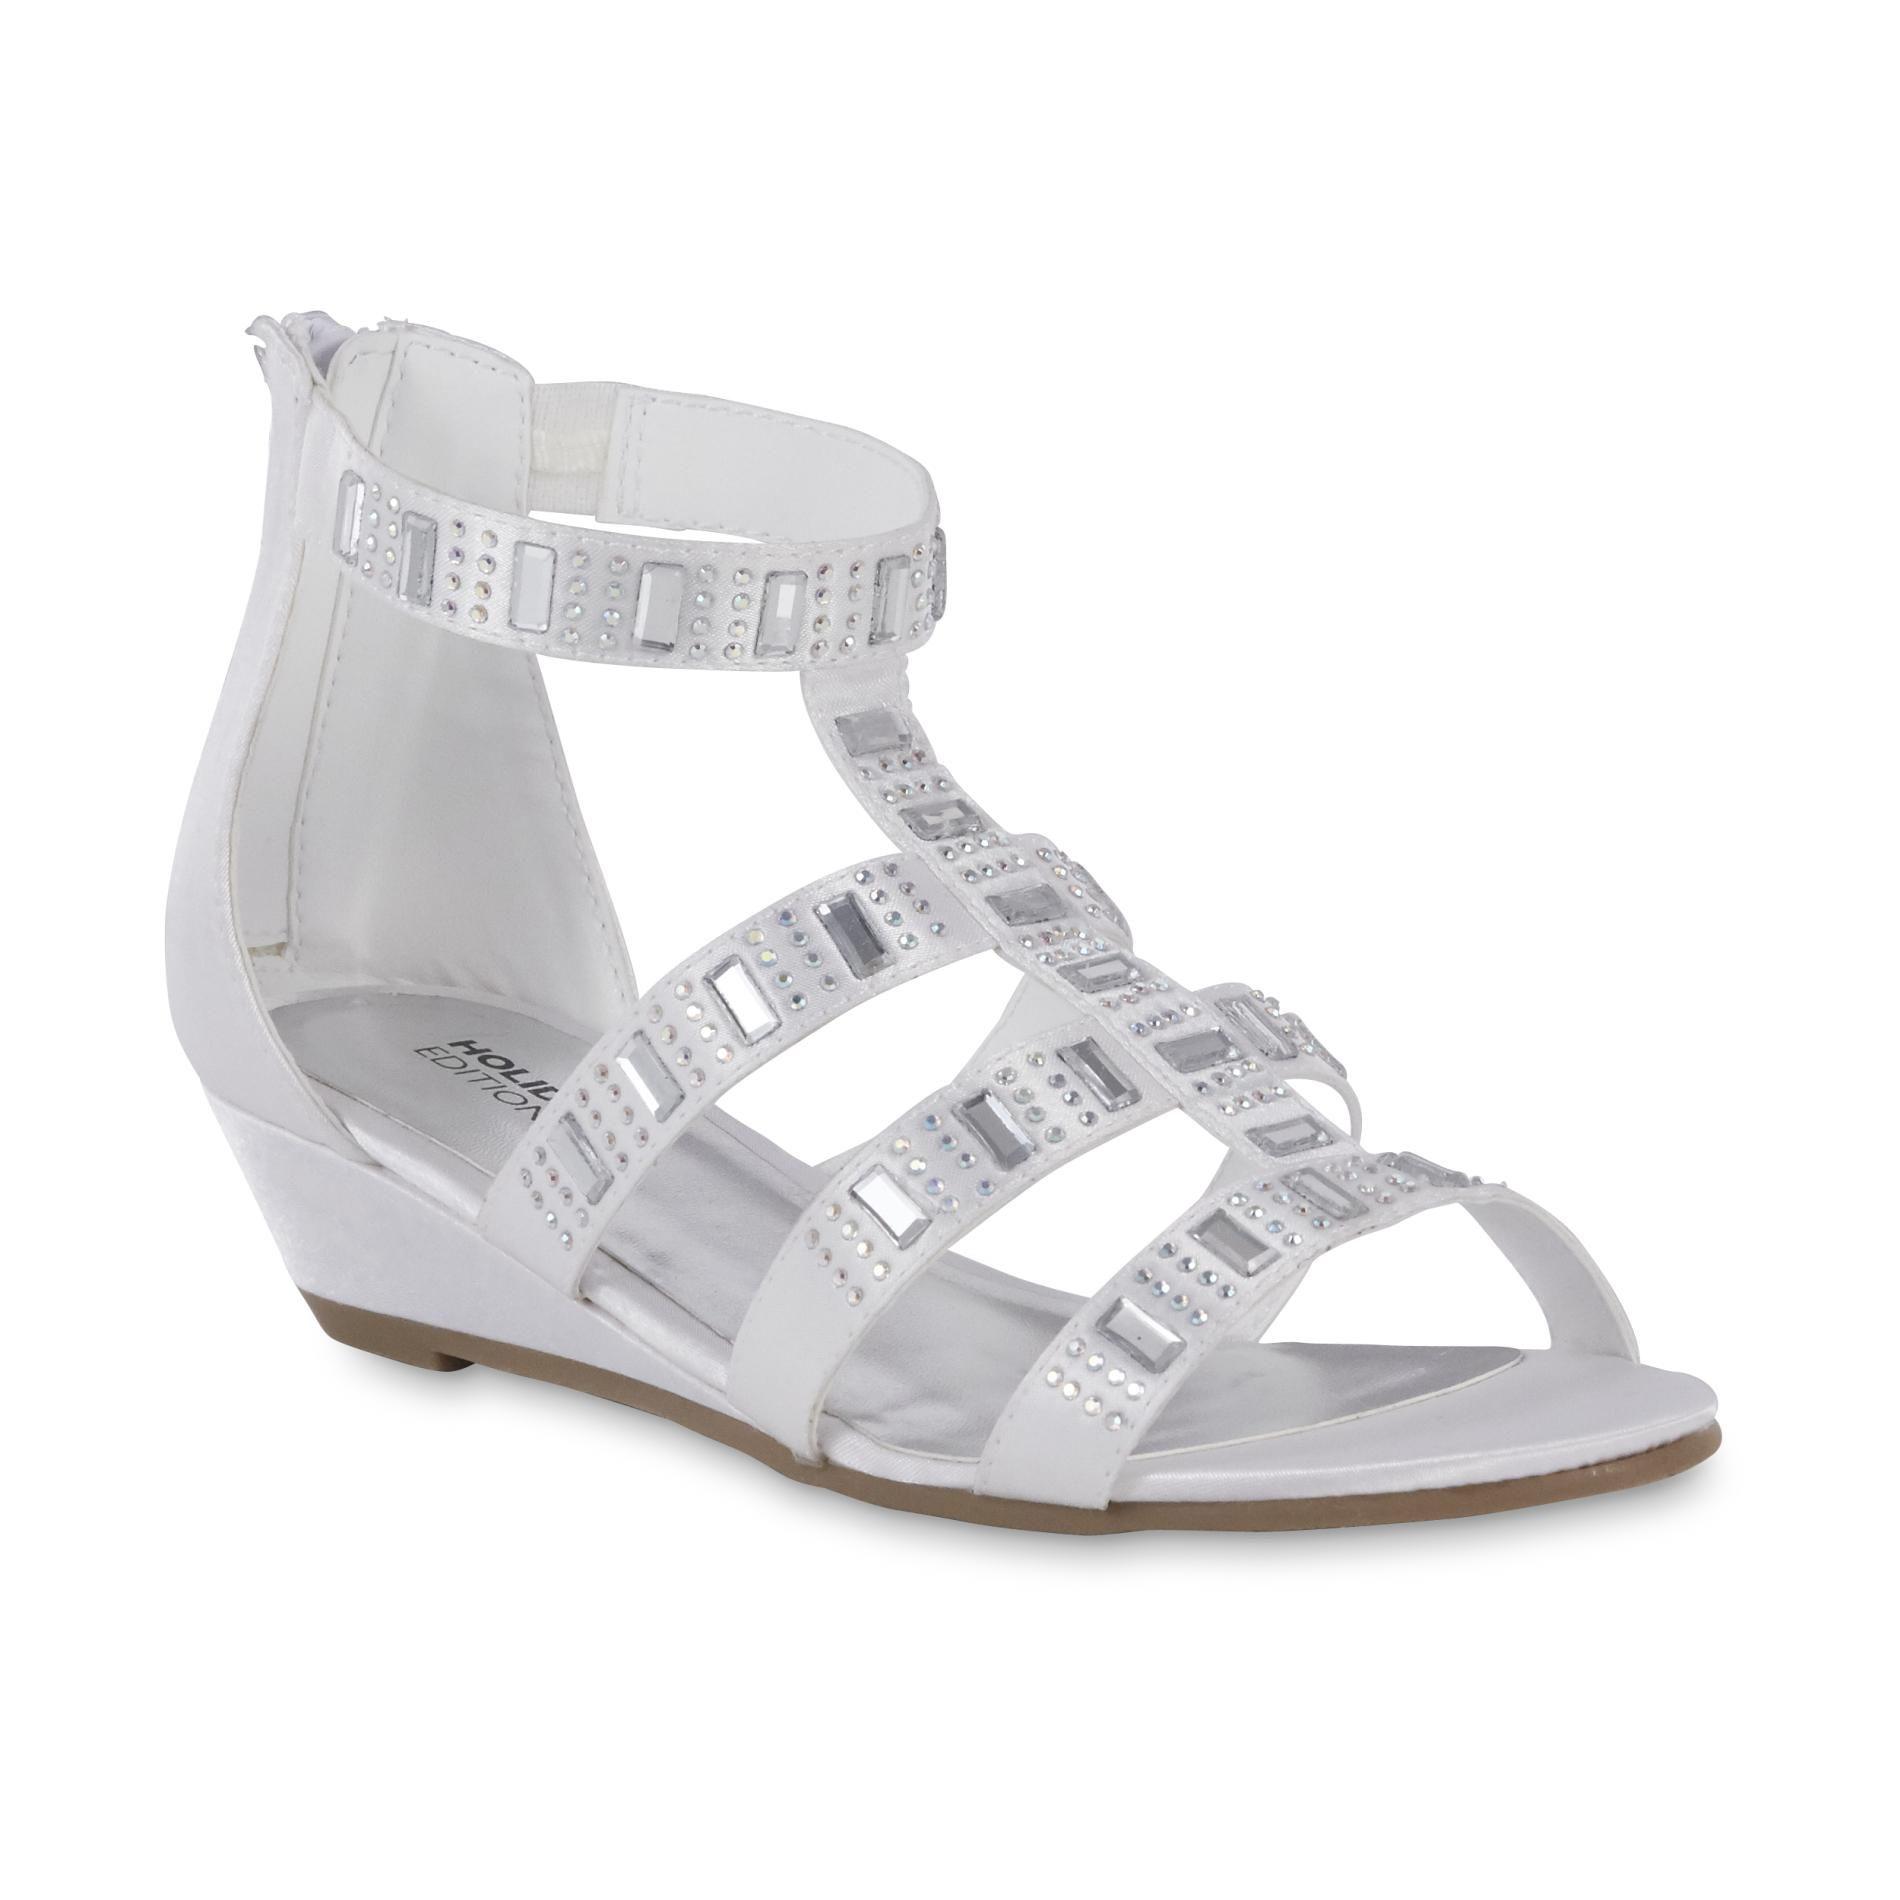 6fbd13c72be122 Holiday Editions Girls  Kari Gladiator Wedge Sandal